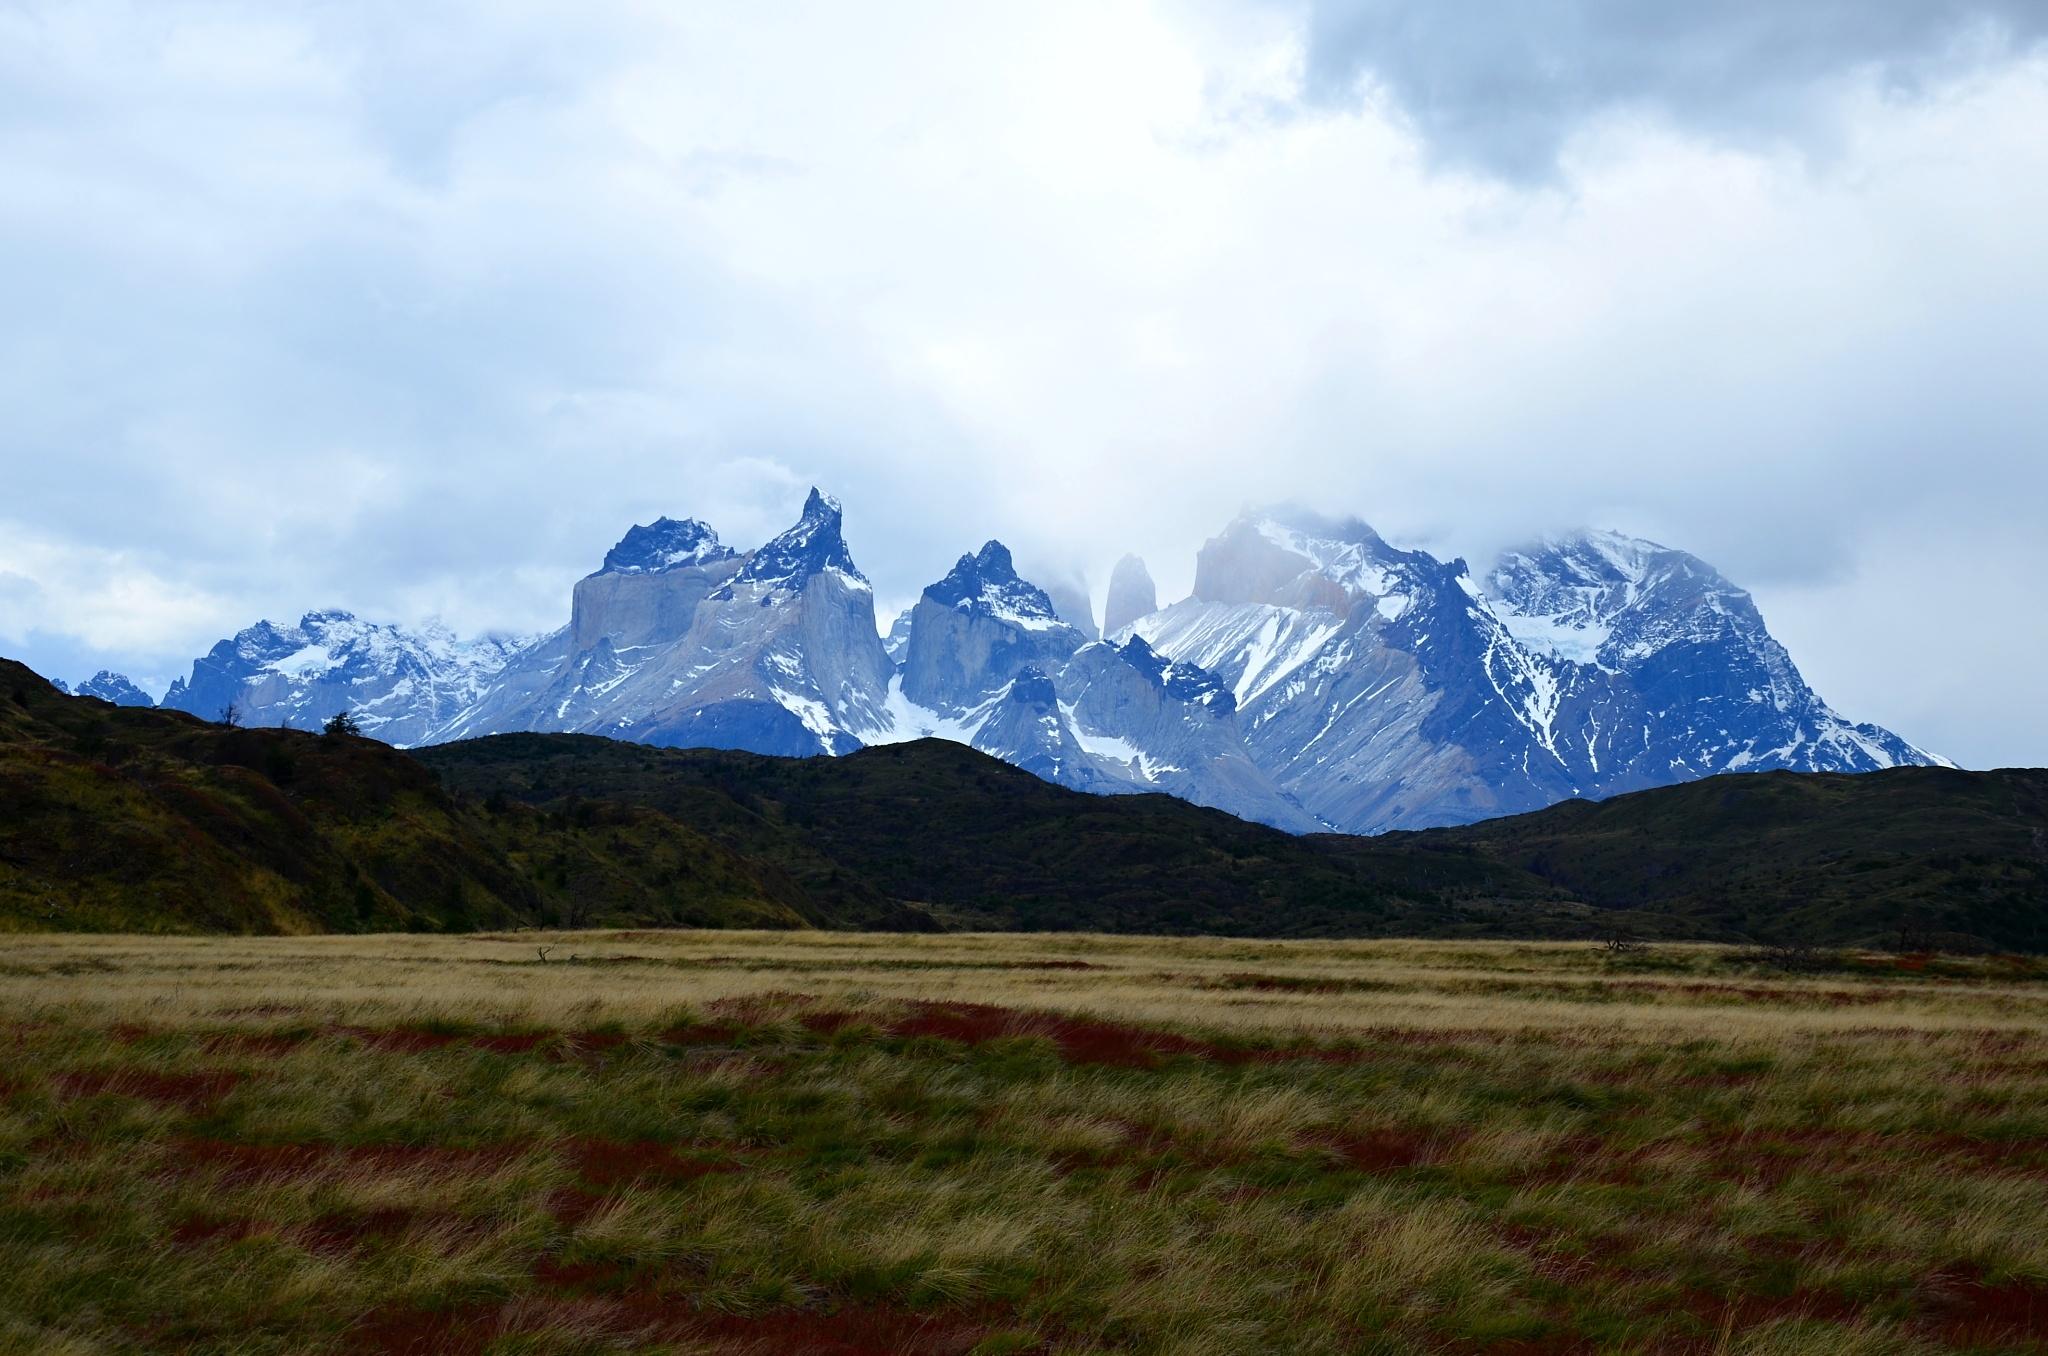 Pampa a v pozadí Cuernos del Paine